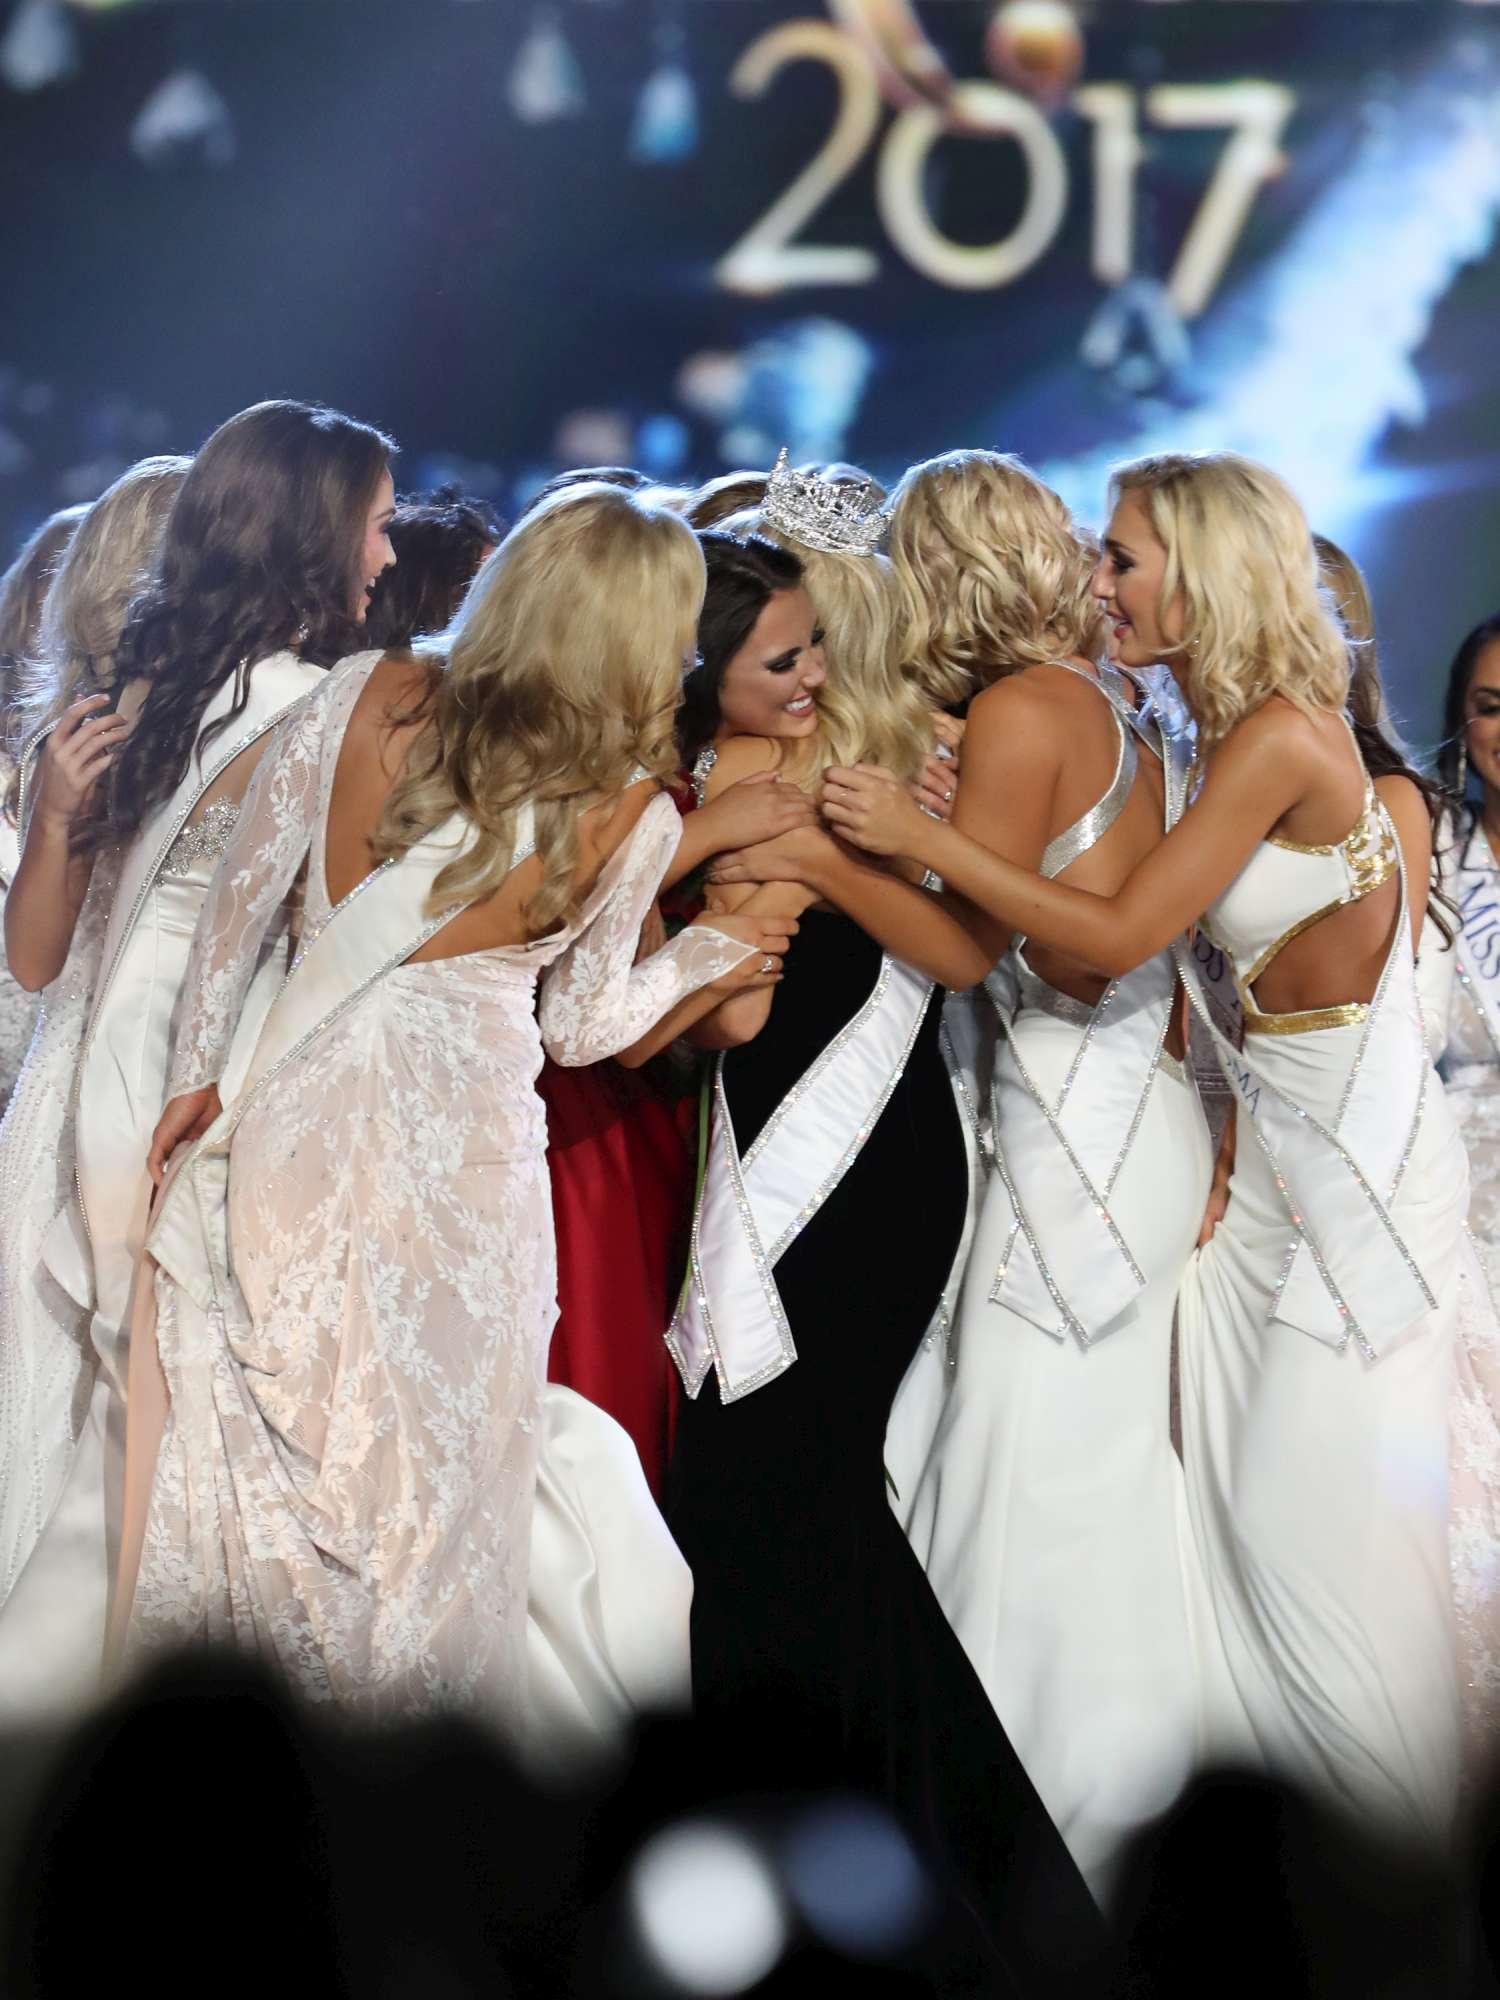 Savvy Shields è la nuova Miss America